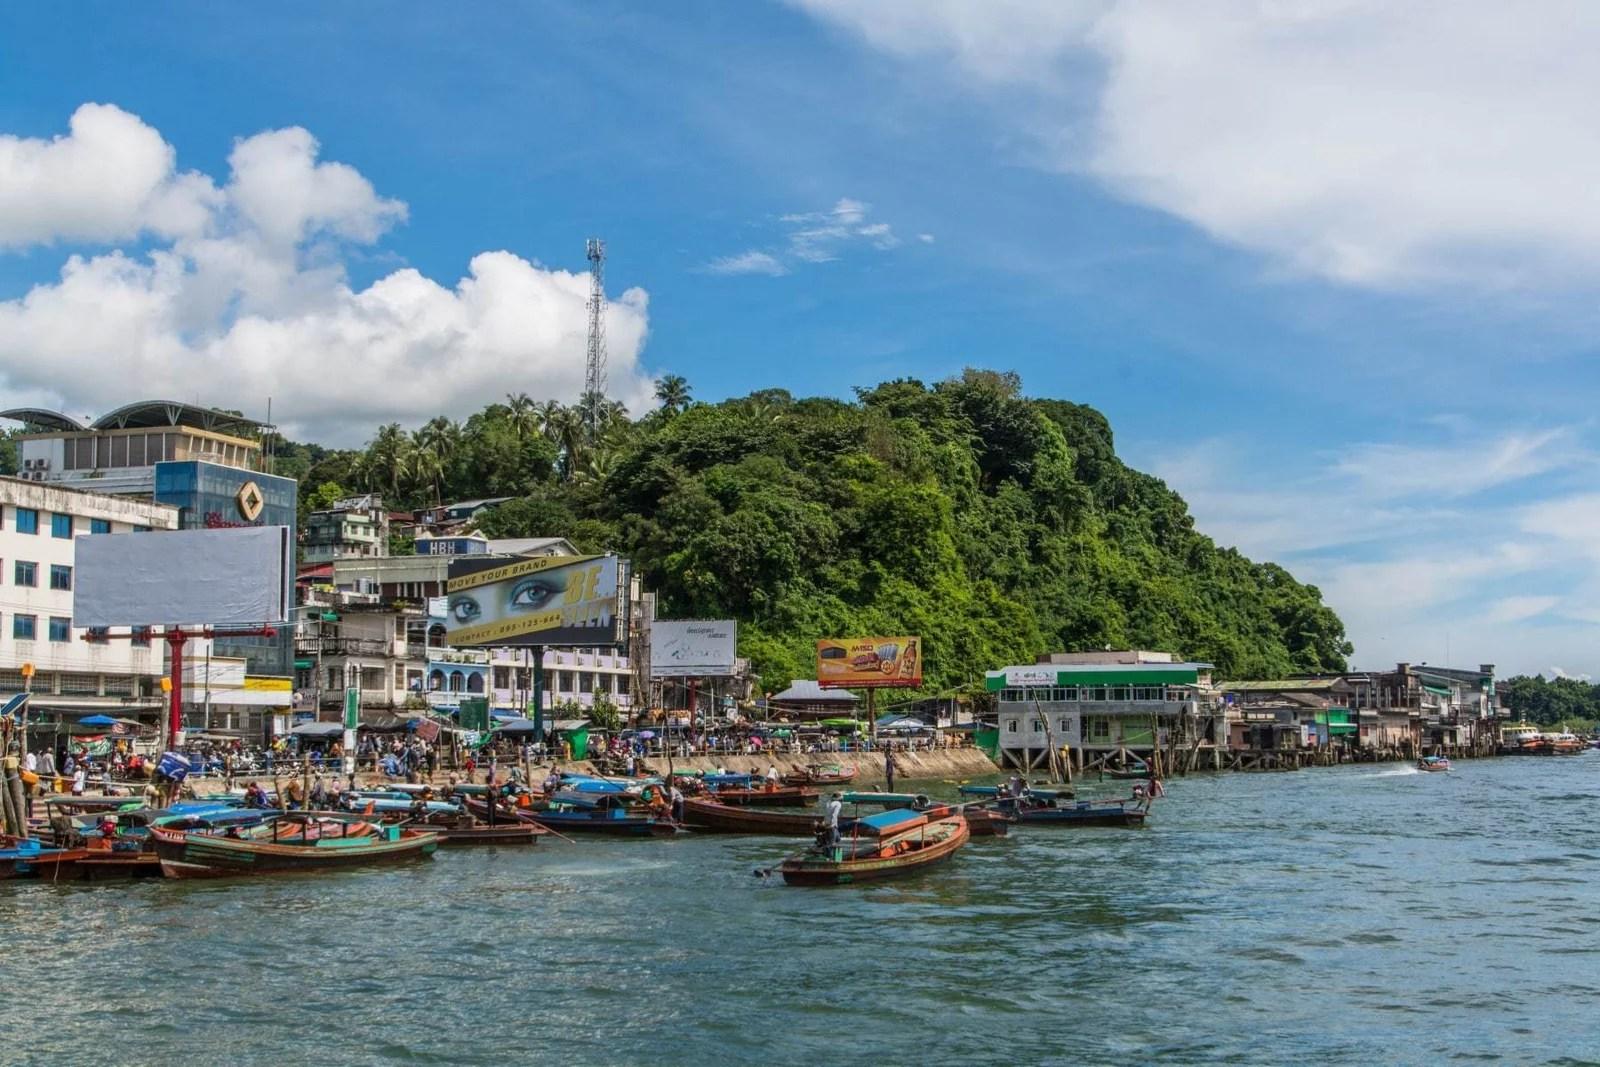 quai arrivée kawthaung birmanie